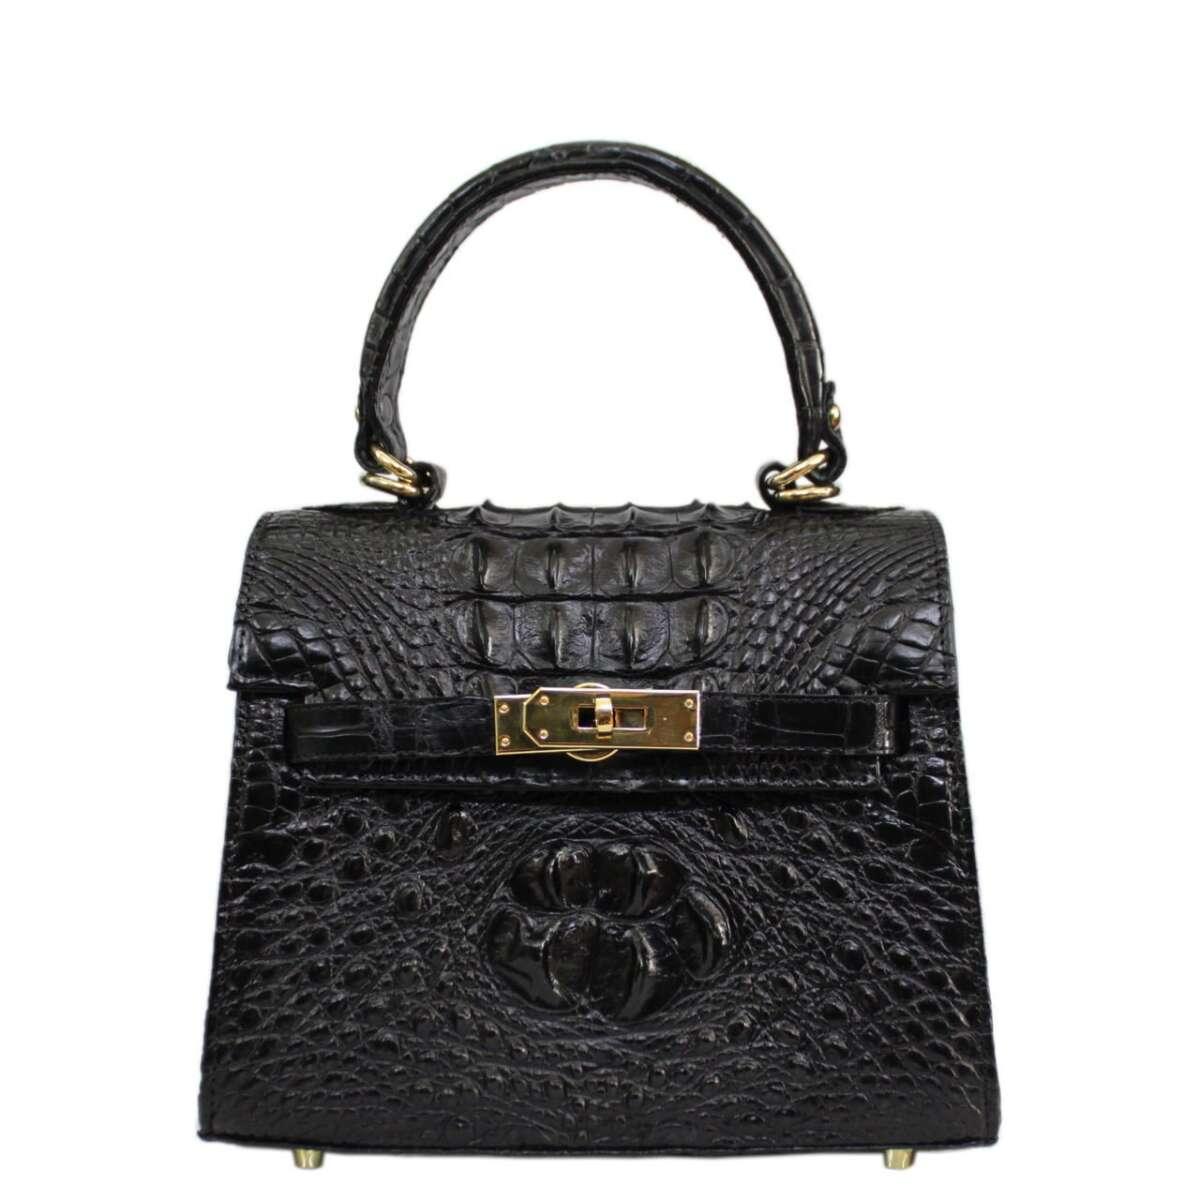 Crocodile leather handbag S042a